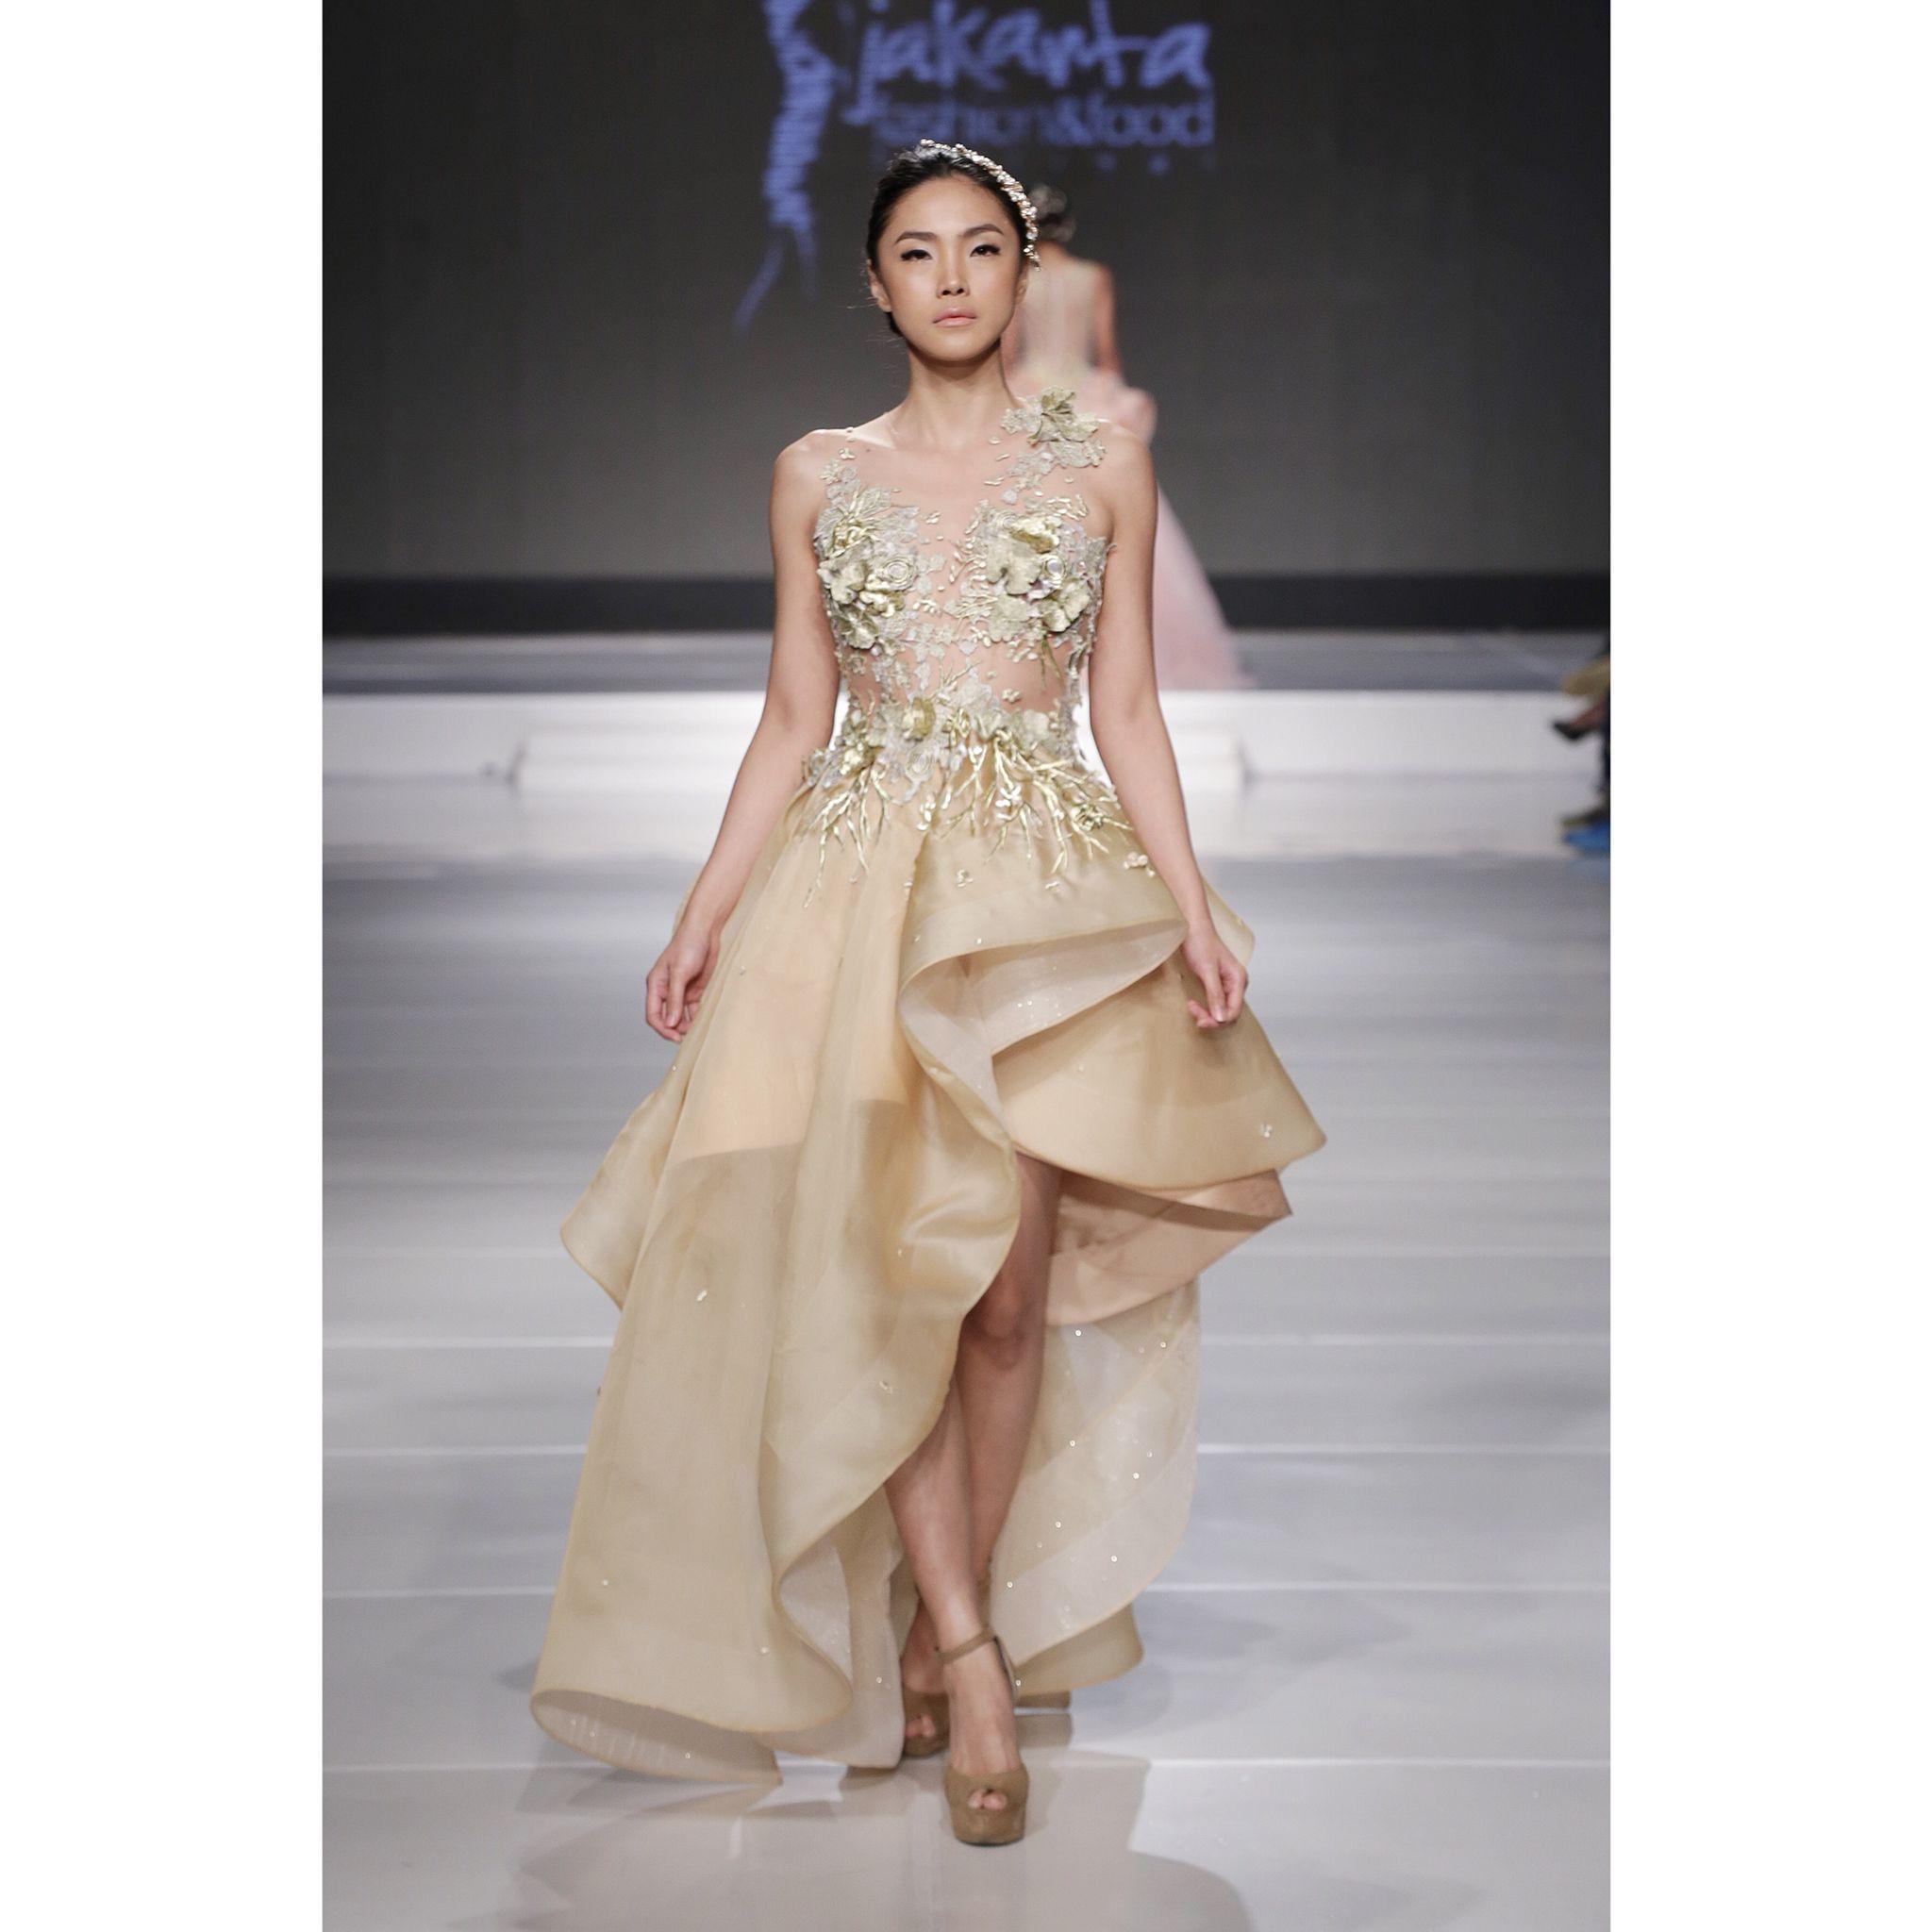 Designer Wedding Gown Rental: Transparent Short Gown In Golden Floral Embroidery